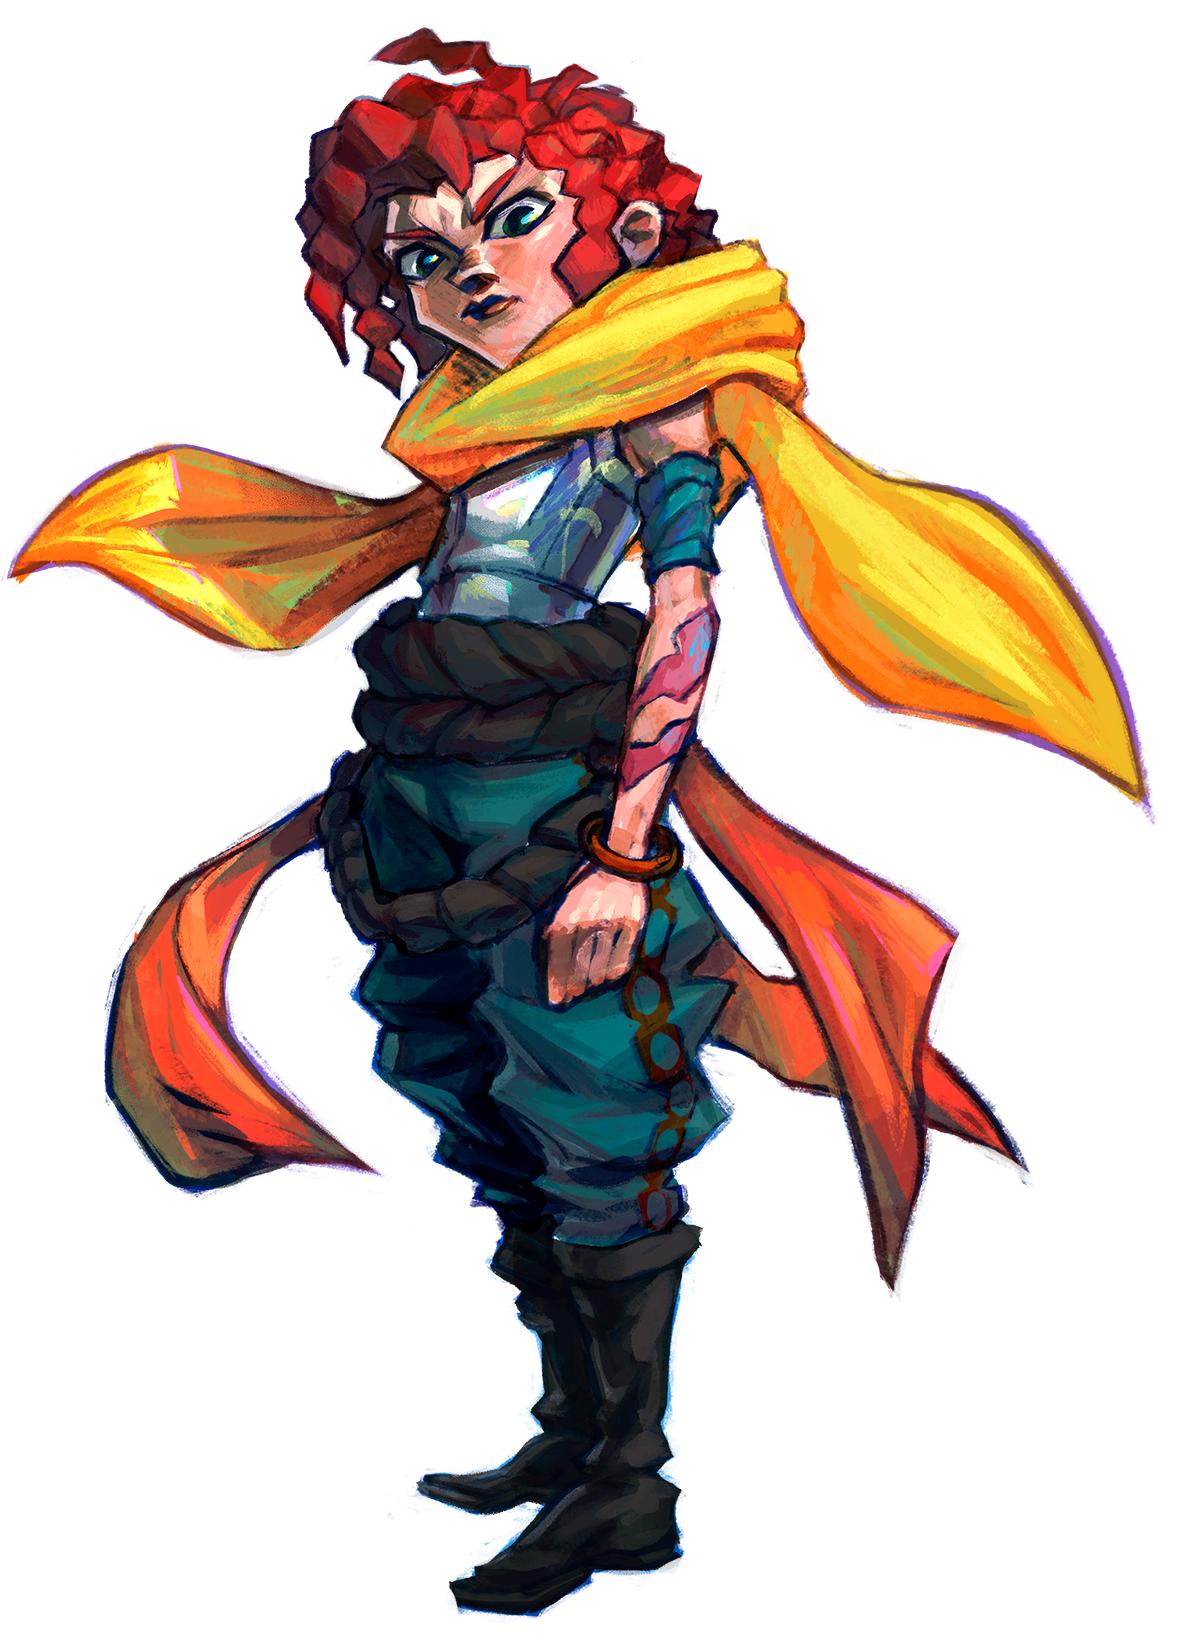 Rufina - Unreal Engine Level — Nick Graves